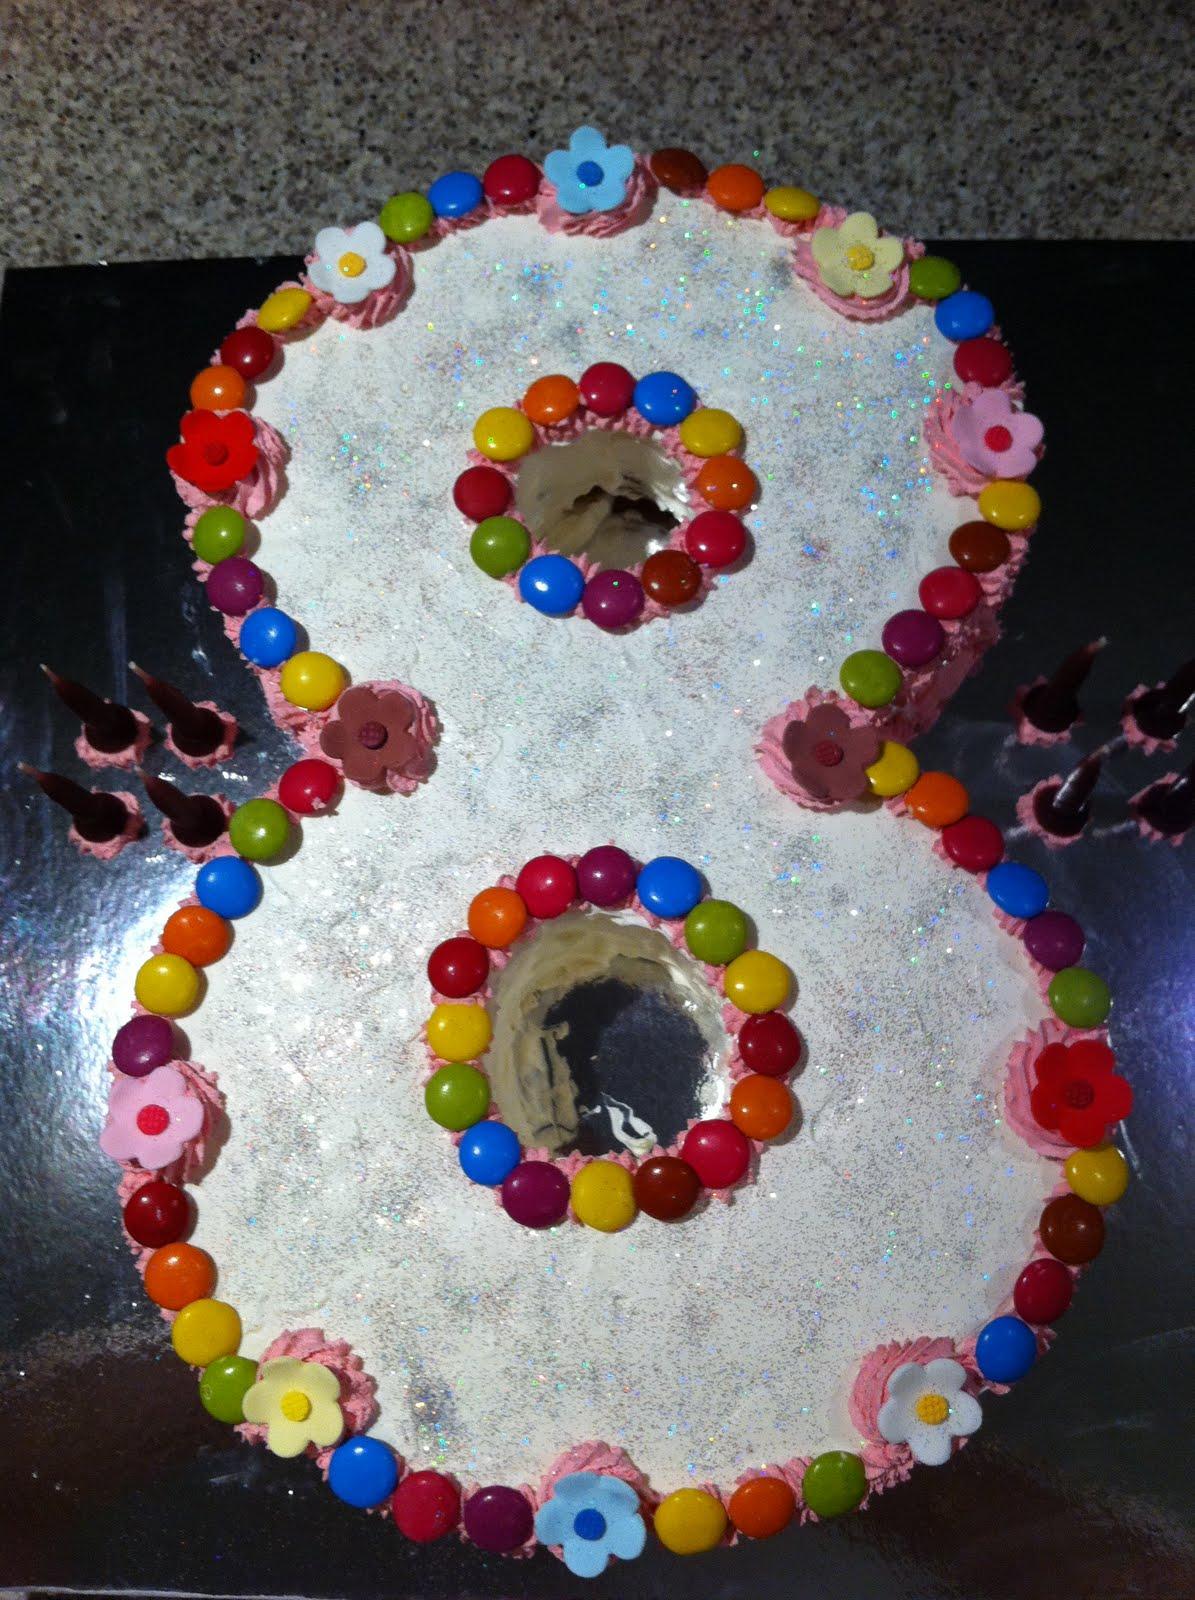 8 No 8 Shaped Cakes Photo 8 Shaped Birthday Cake Birthday Cake